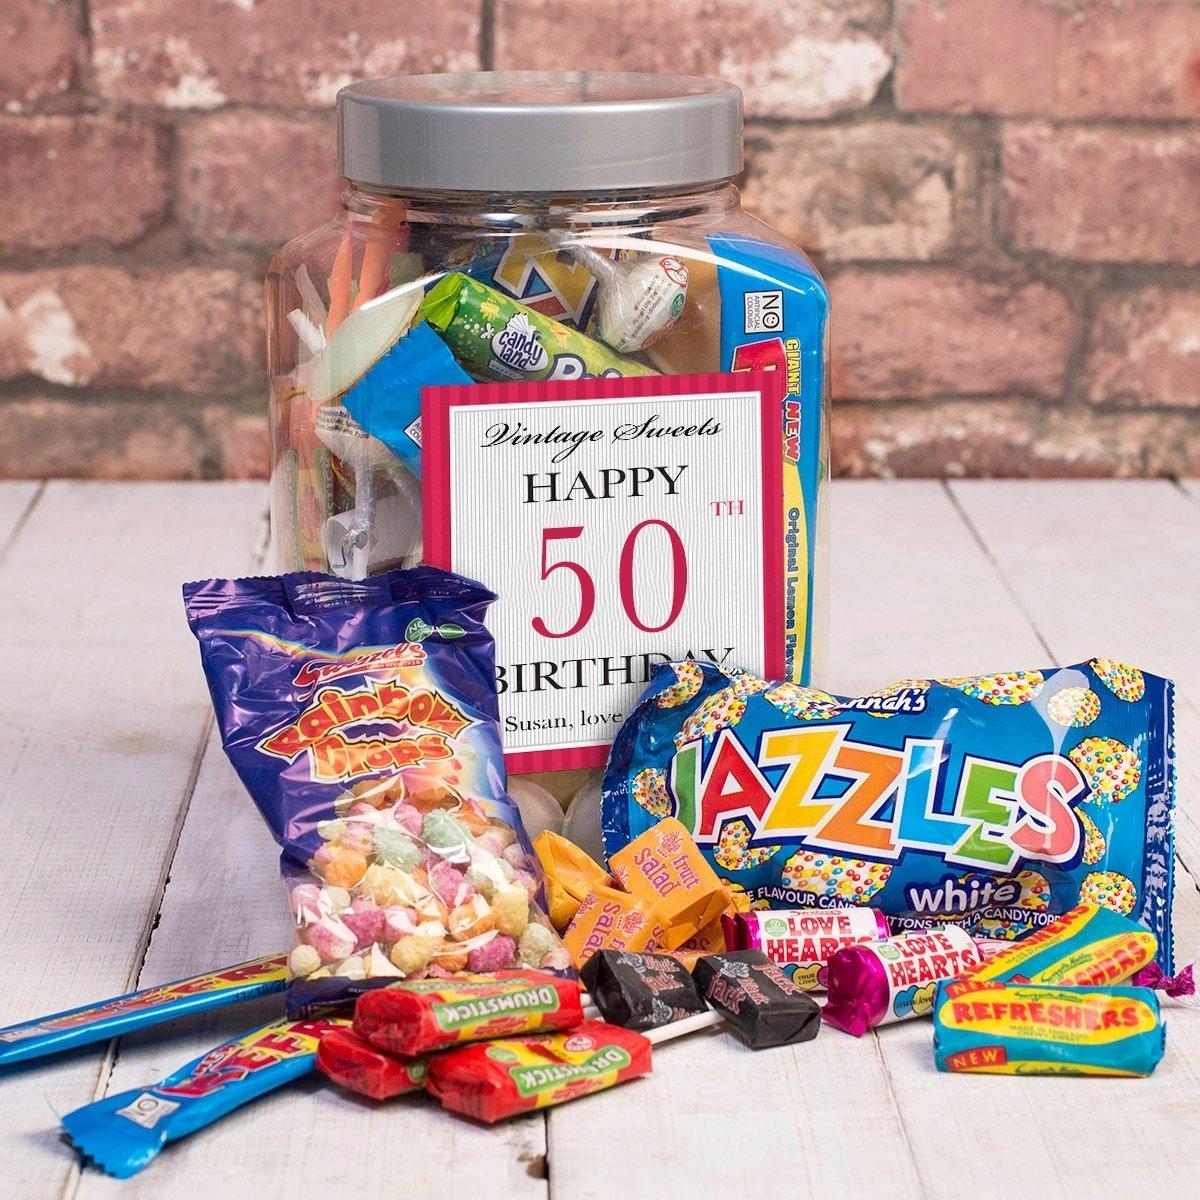 10 Pretty 50 Birthday Gift Ideas For Her personalised retro sweet jar happy 50th birthday gettingpersonal 4